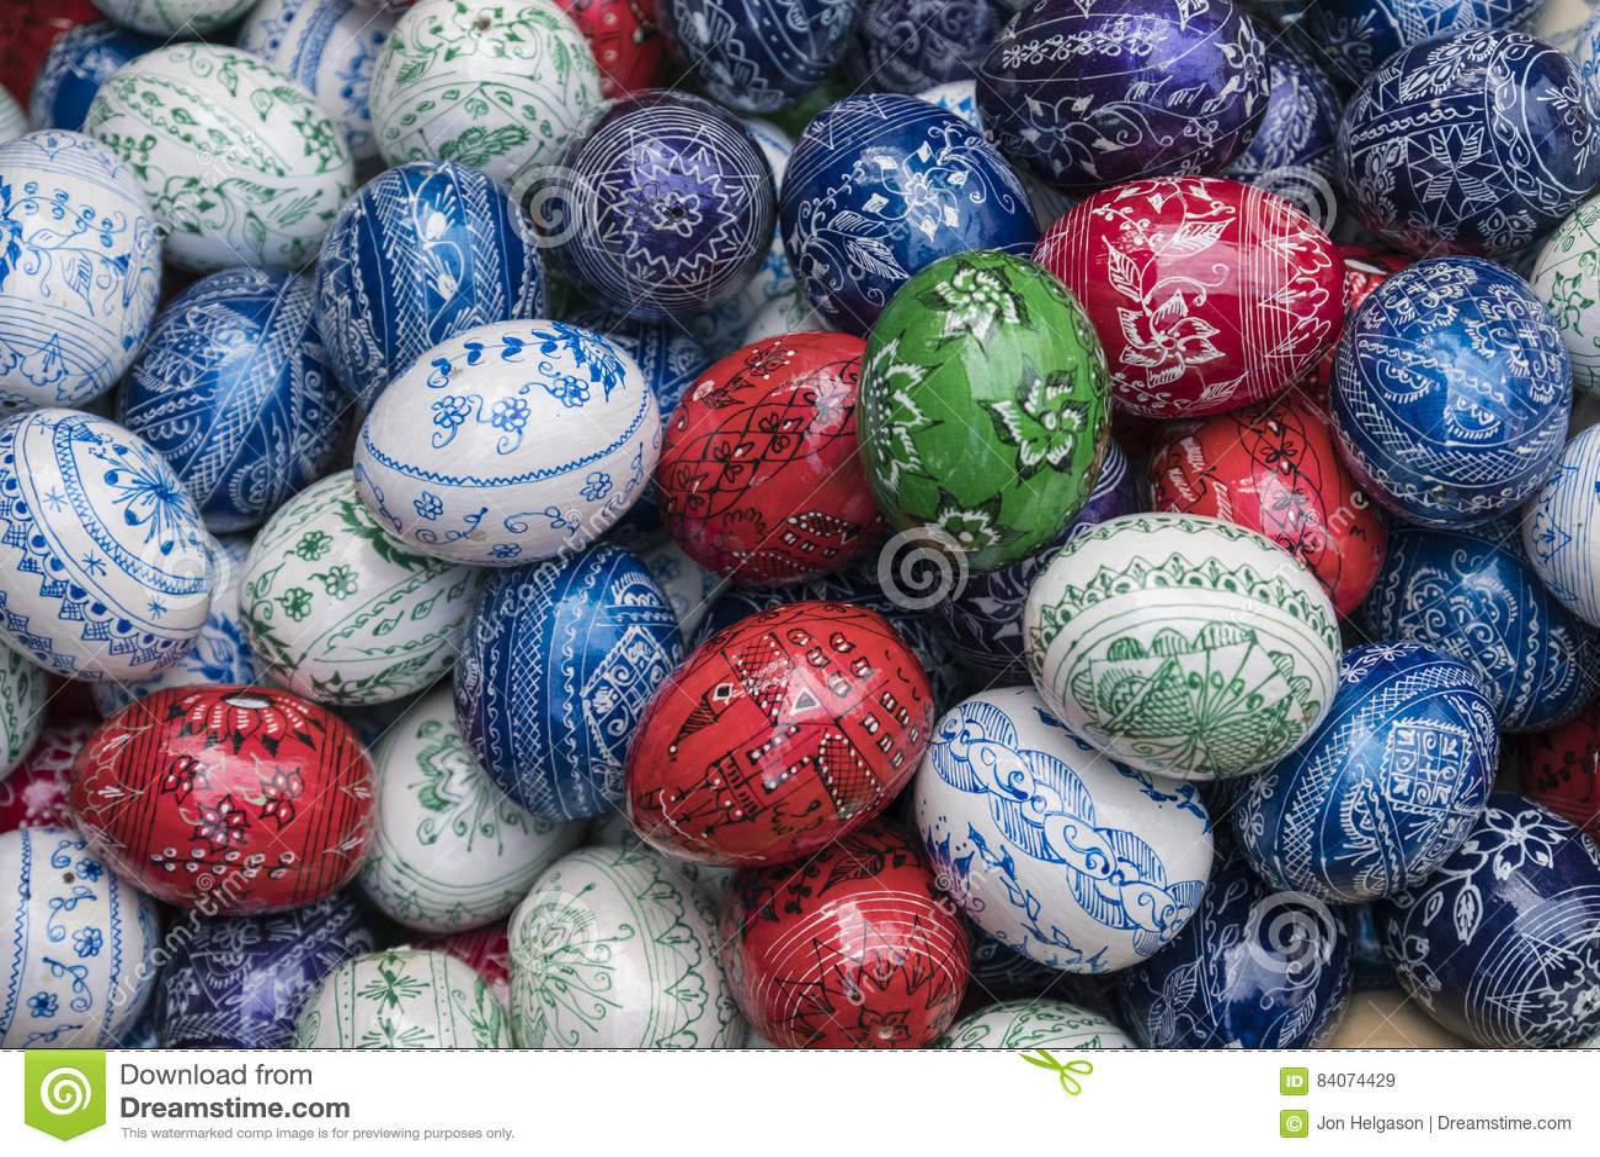 Uova Di Ceramica Dipinte A Mano.Uova Di Pasqua Dipinte A Mano Immagine Stock Immagine Di Uova